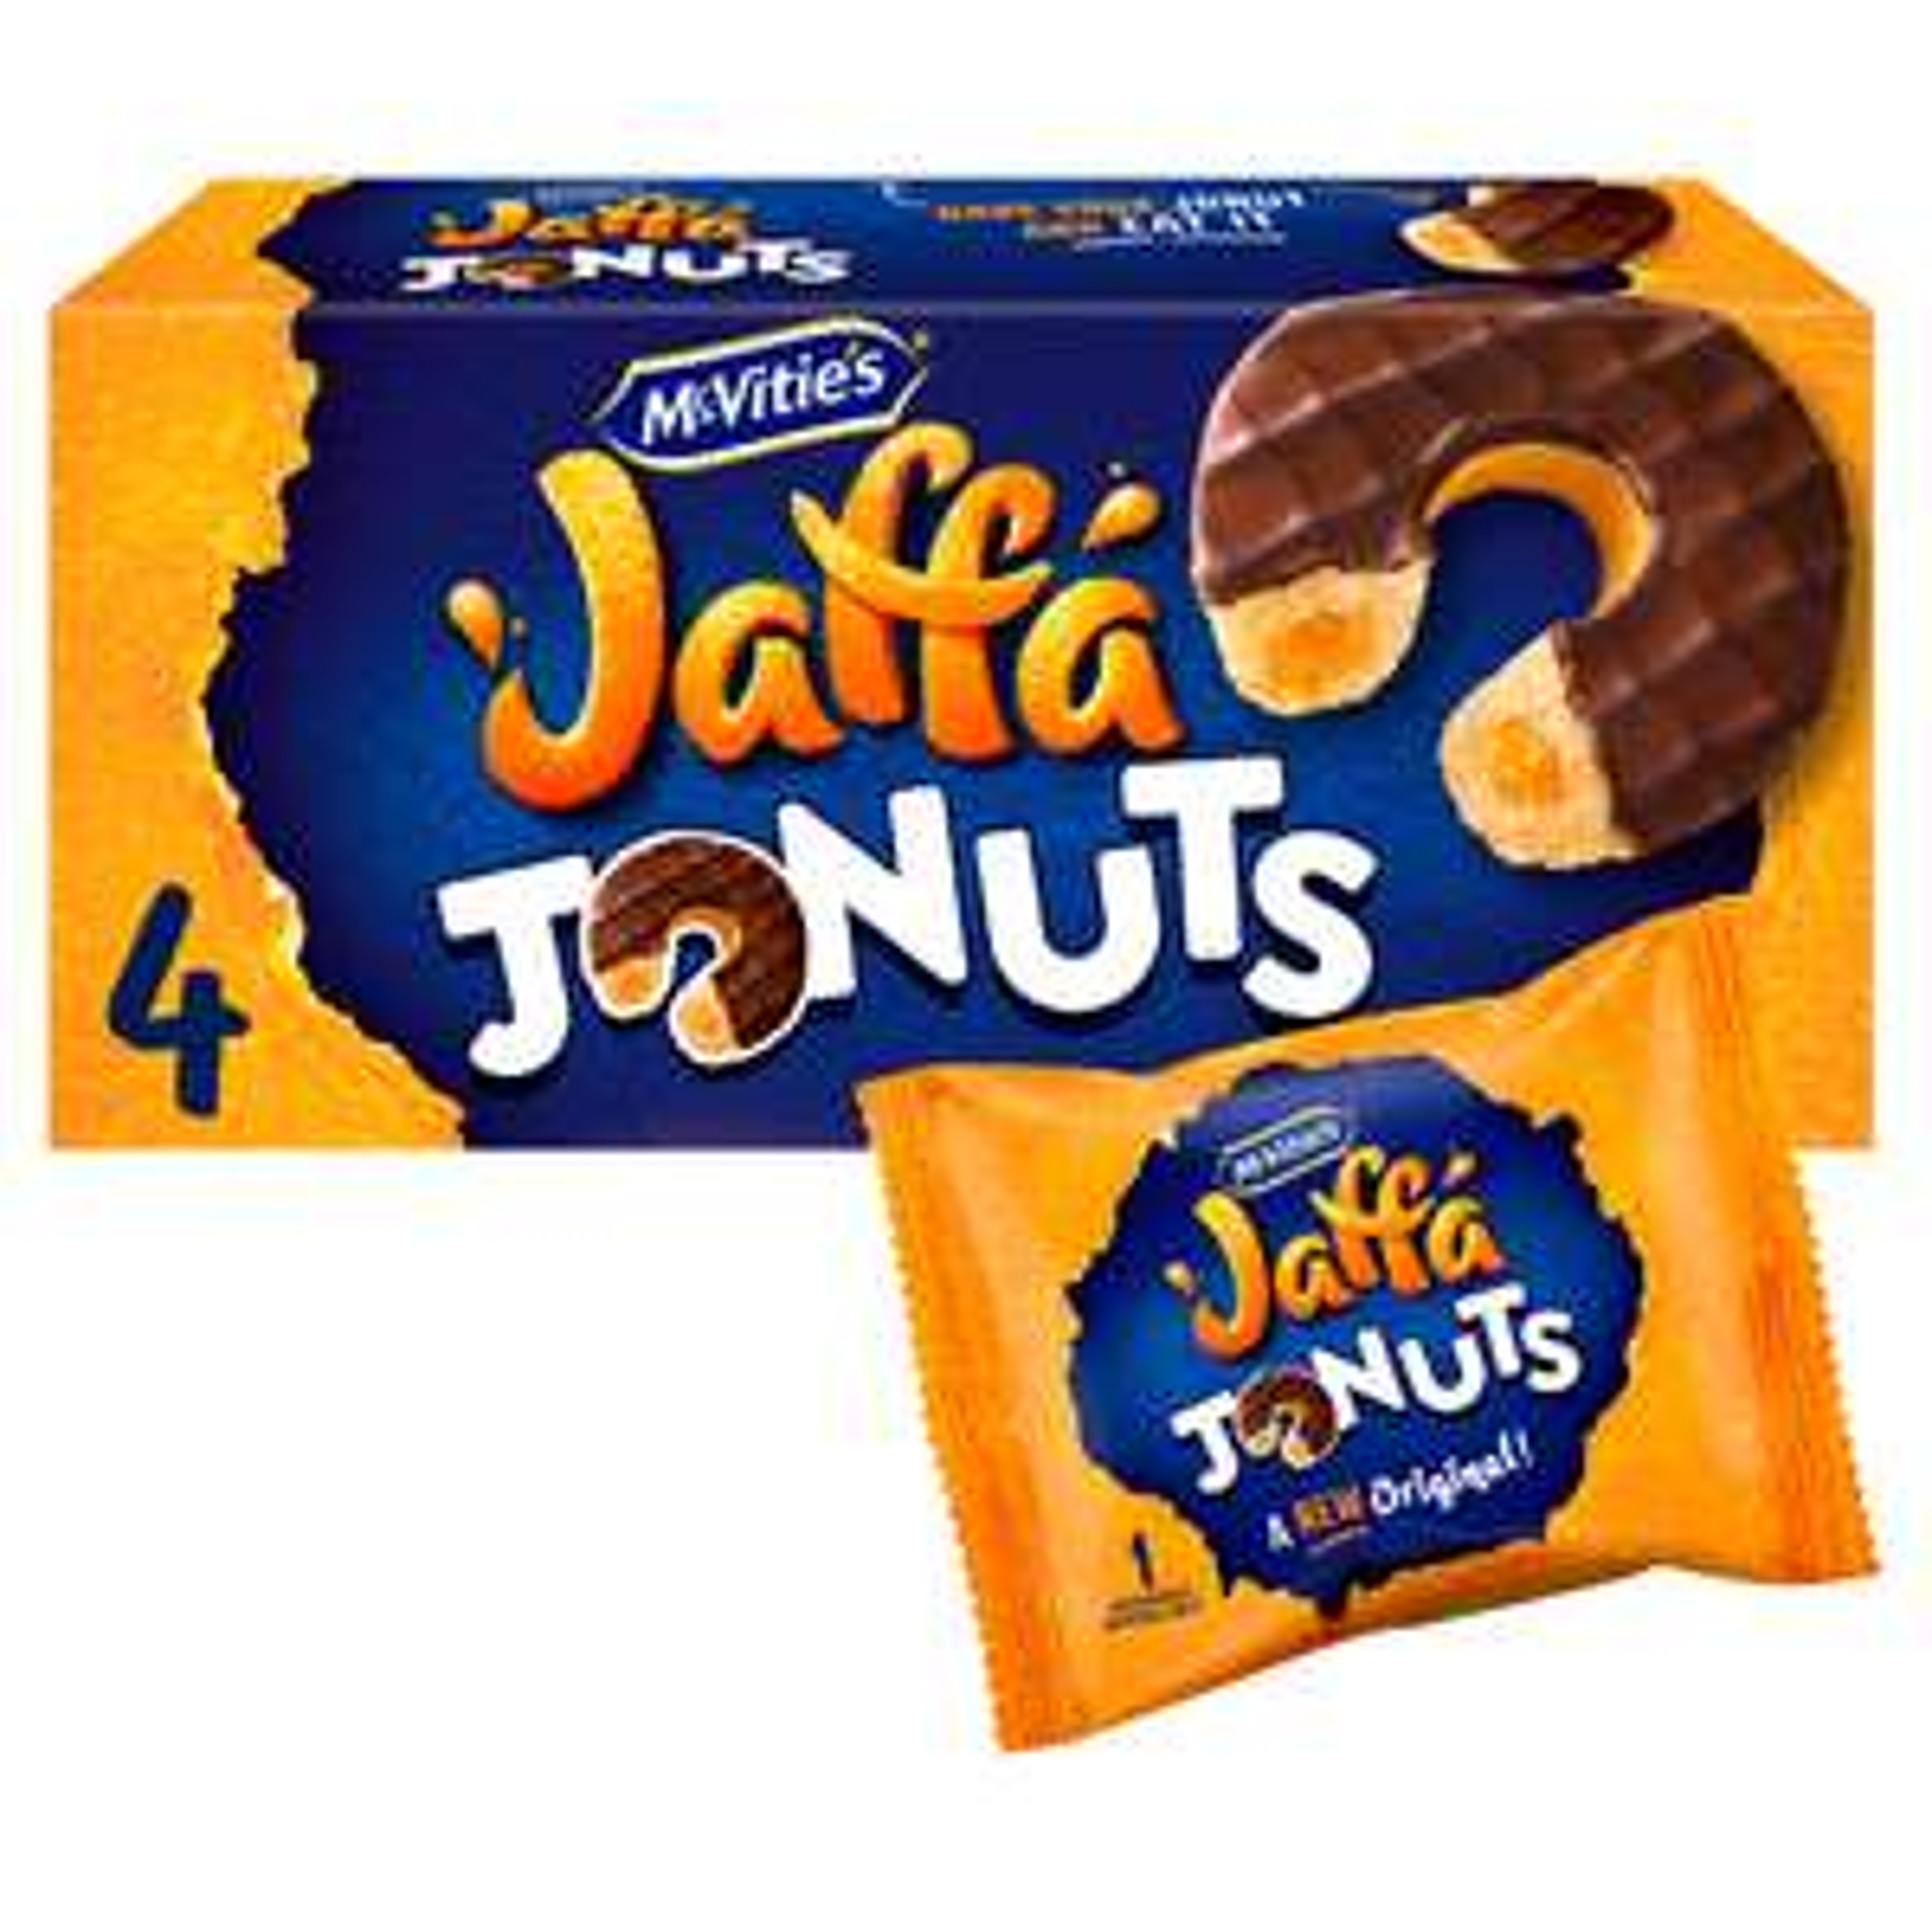 Mcvitie's Jaffa Cake Jonuts Biscuits 4 pack £1.13 @ Tesco express (Hammersmith)